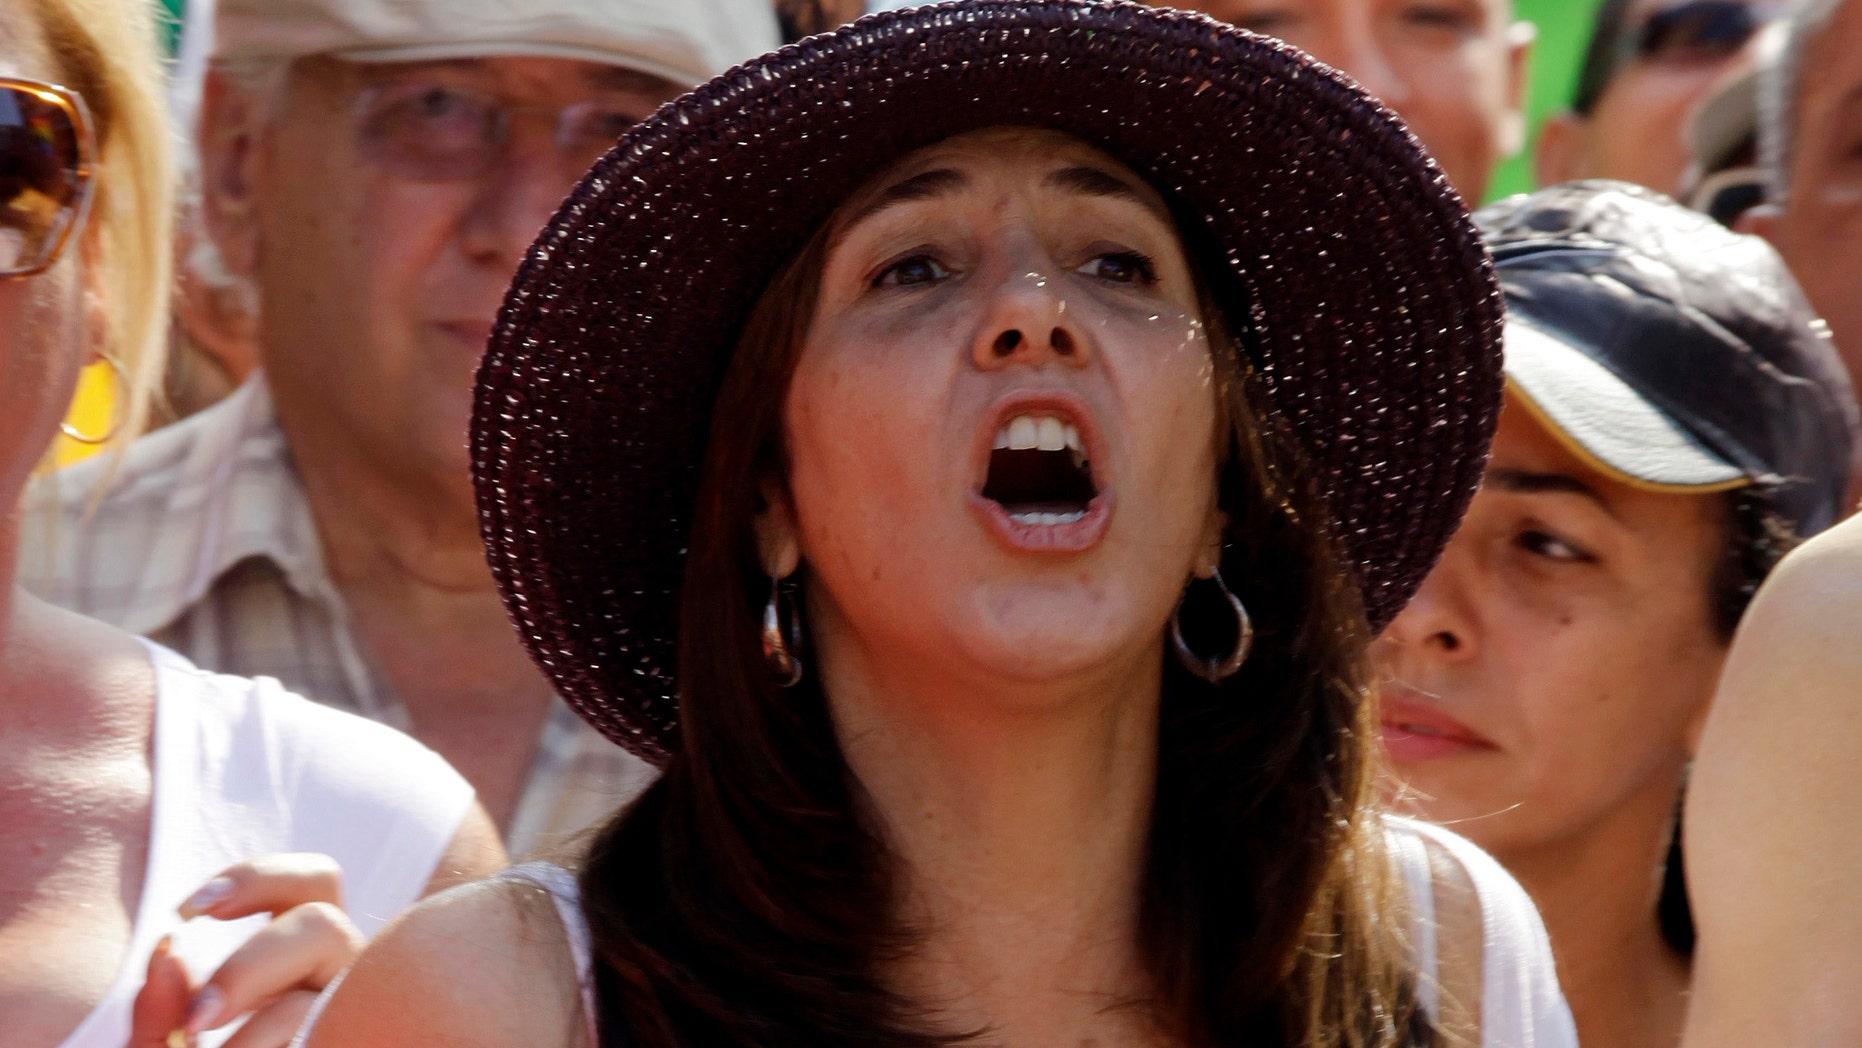 Mariela Castro, daughter of Cuba's President Raul Castro. (AP Photo/Javier Galeano)